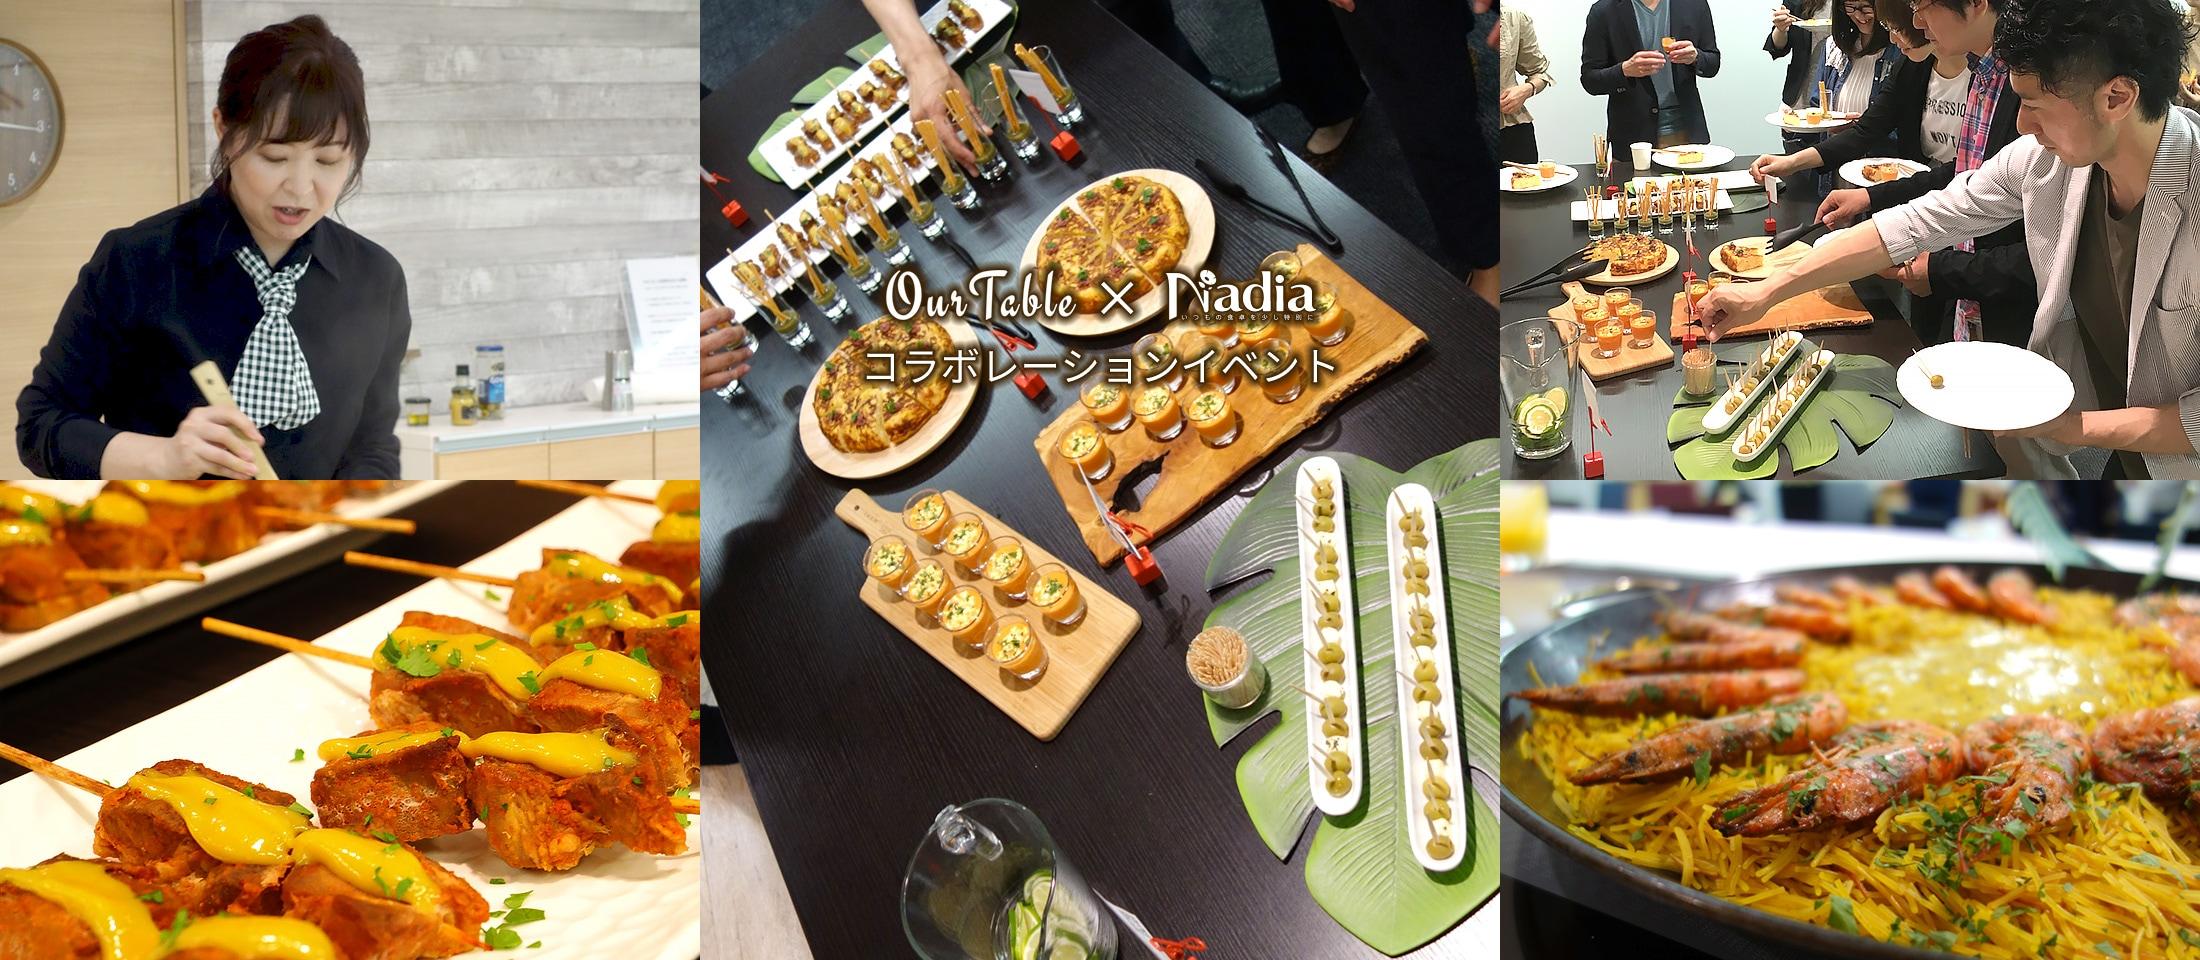 Our Table × Nadiaタイアップ特別企画